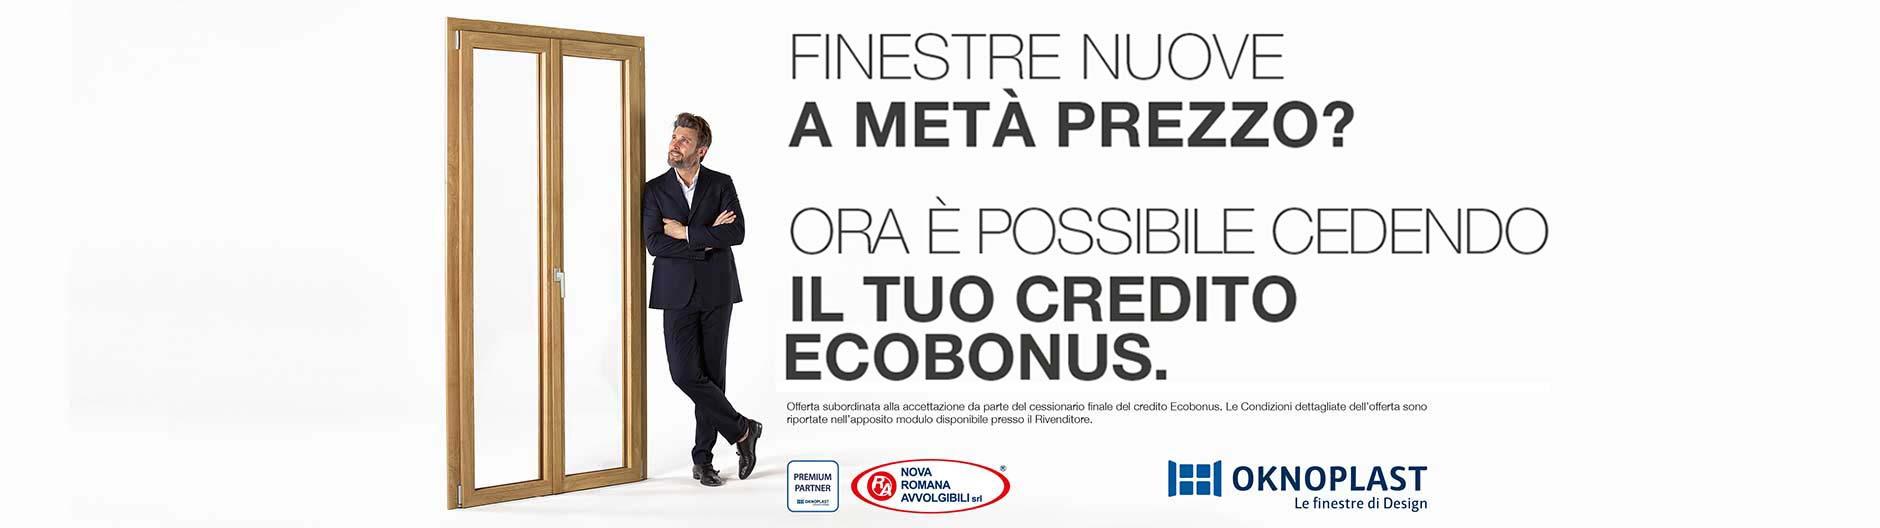 Premium partner Oknoplast Roma